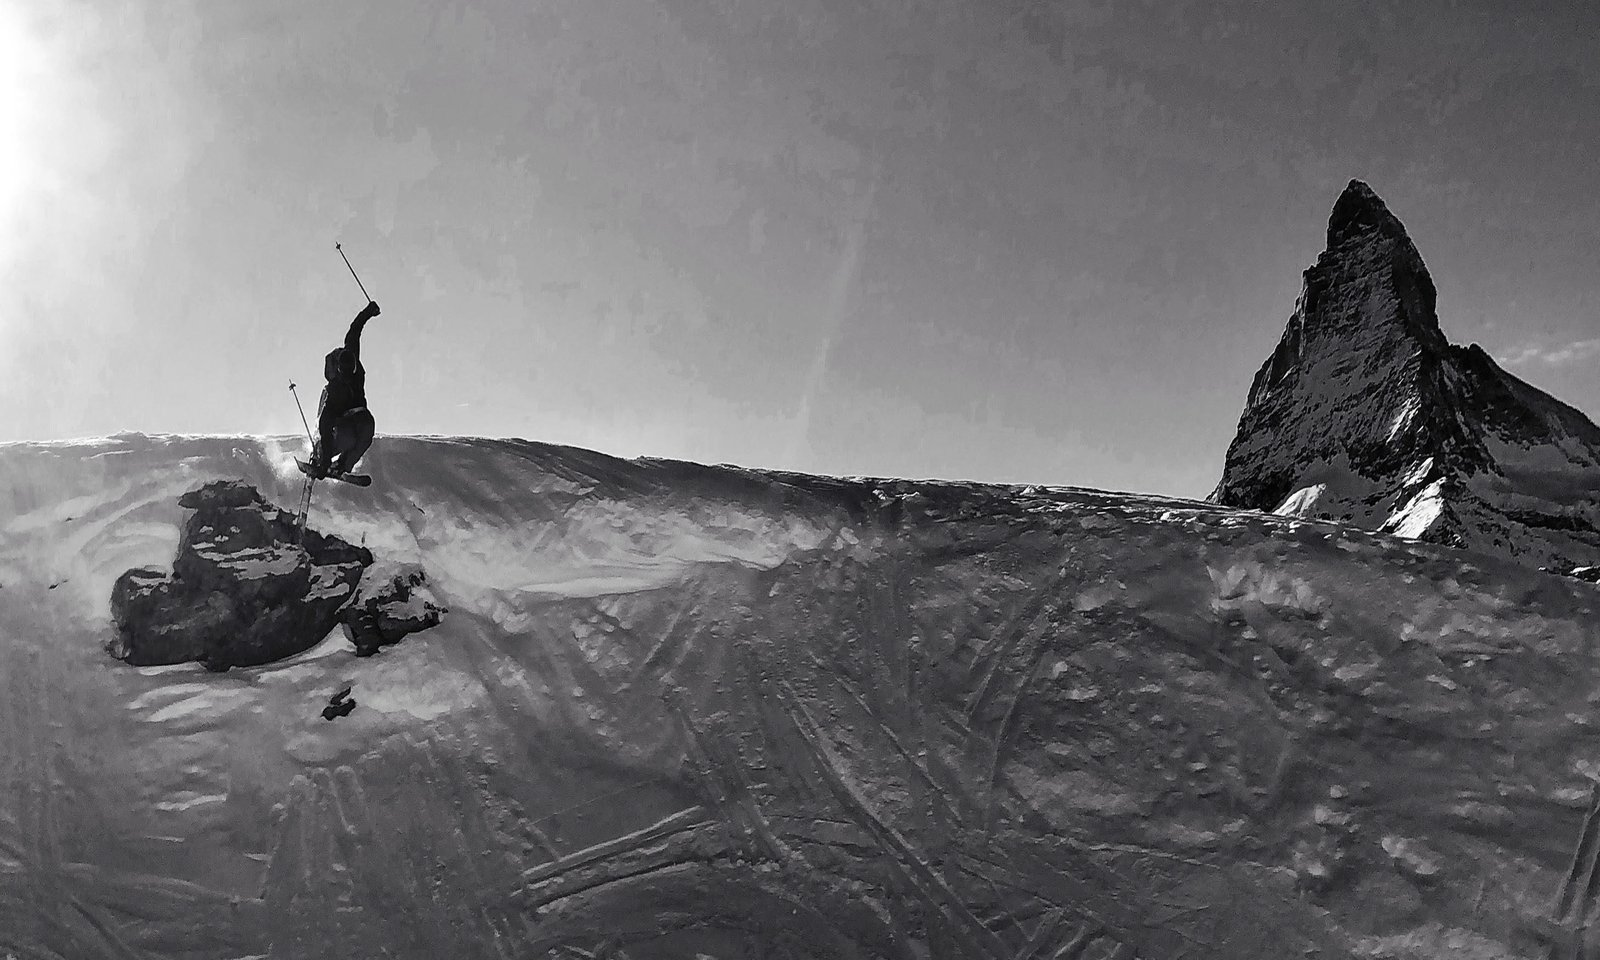 Zermatt Mute Cliff Drop